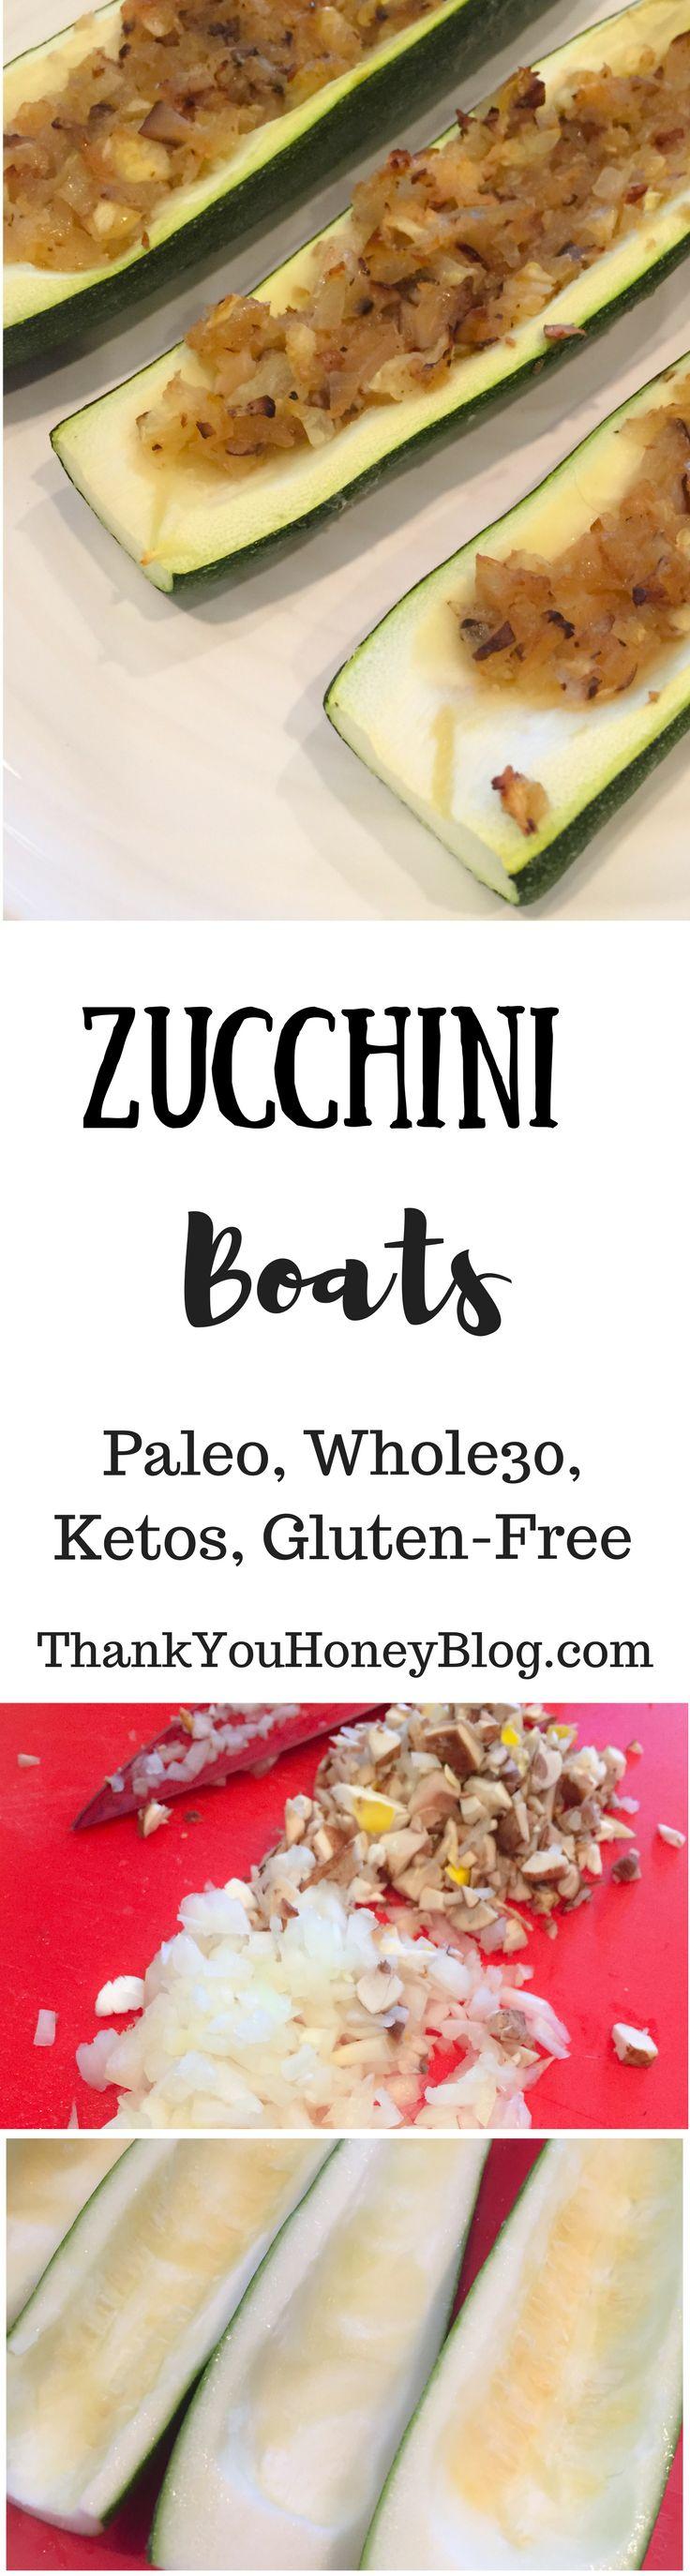 Zucchini Boats, Recipe, Side Dish, Simple Recipe, Clean Eating, Accompaniment, Healthy Recipe, Zucchini Boats, Vegetables, Side Dish Recipe, Whole 30, Keto, Paleo, Vegan